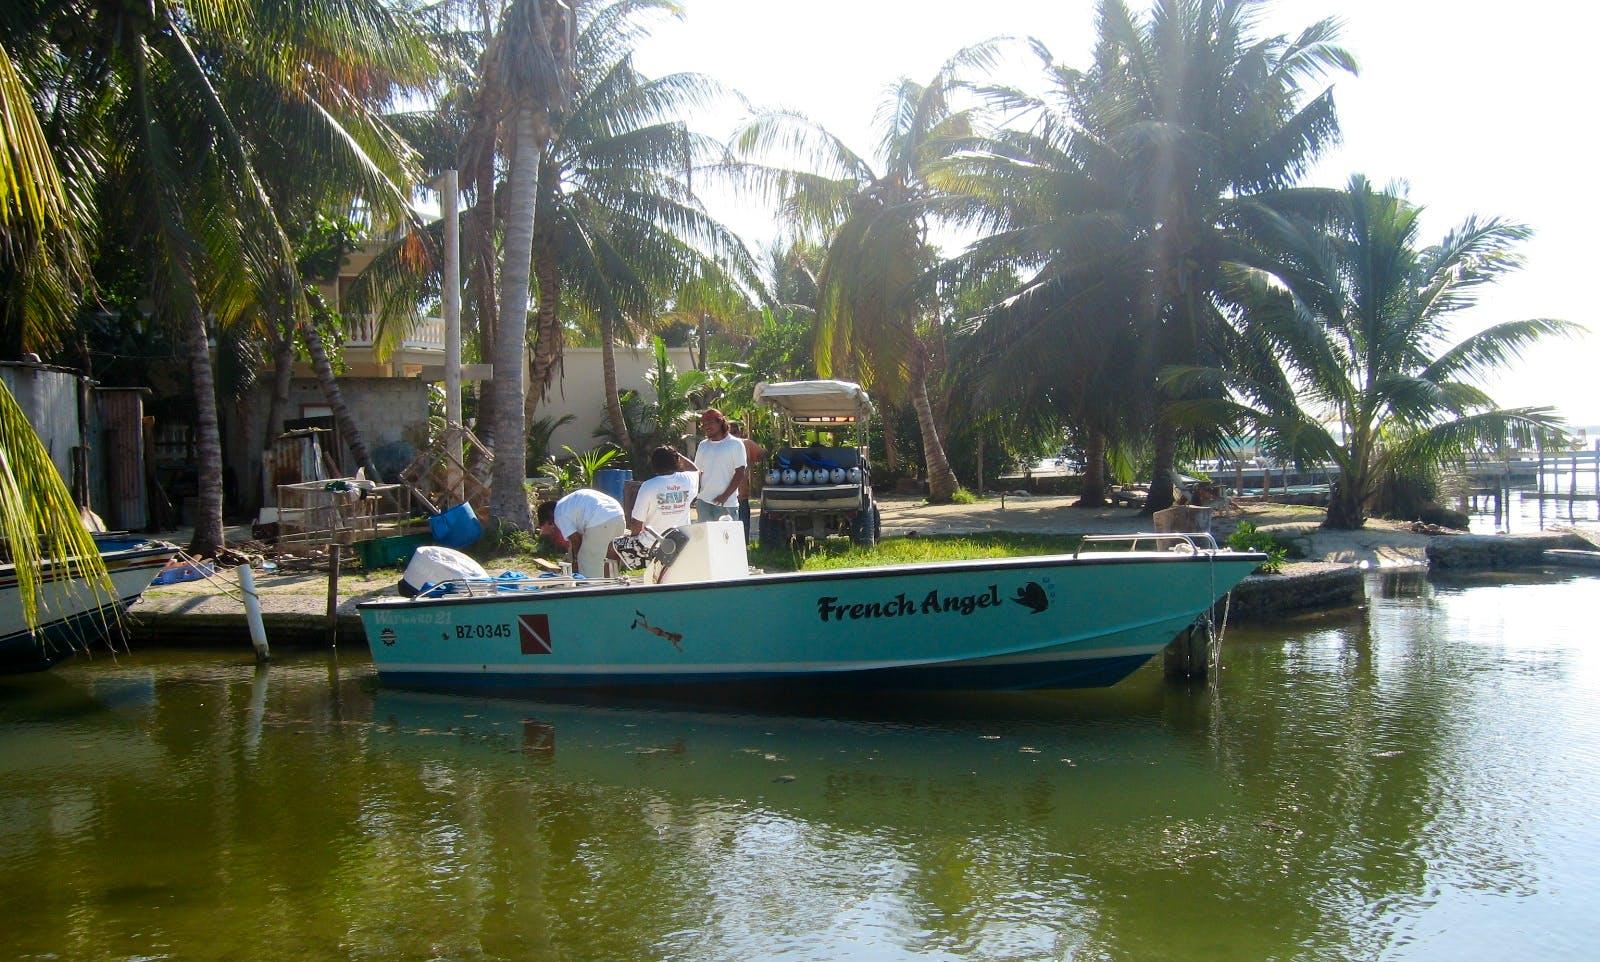 Fishing Charter in Caye Caulker, Belize